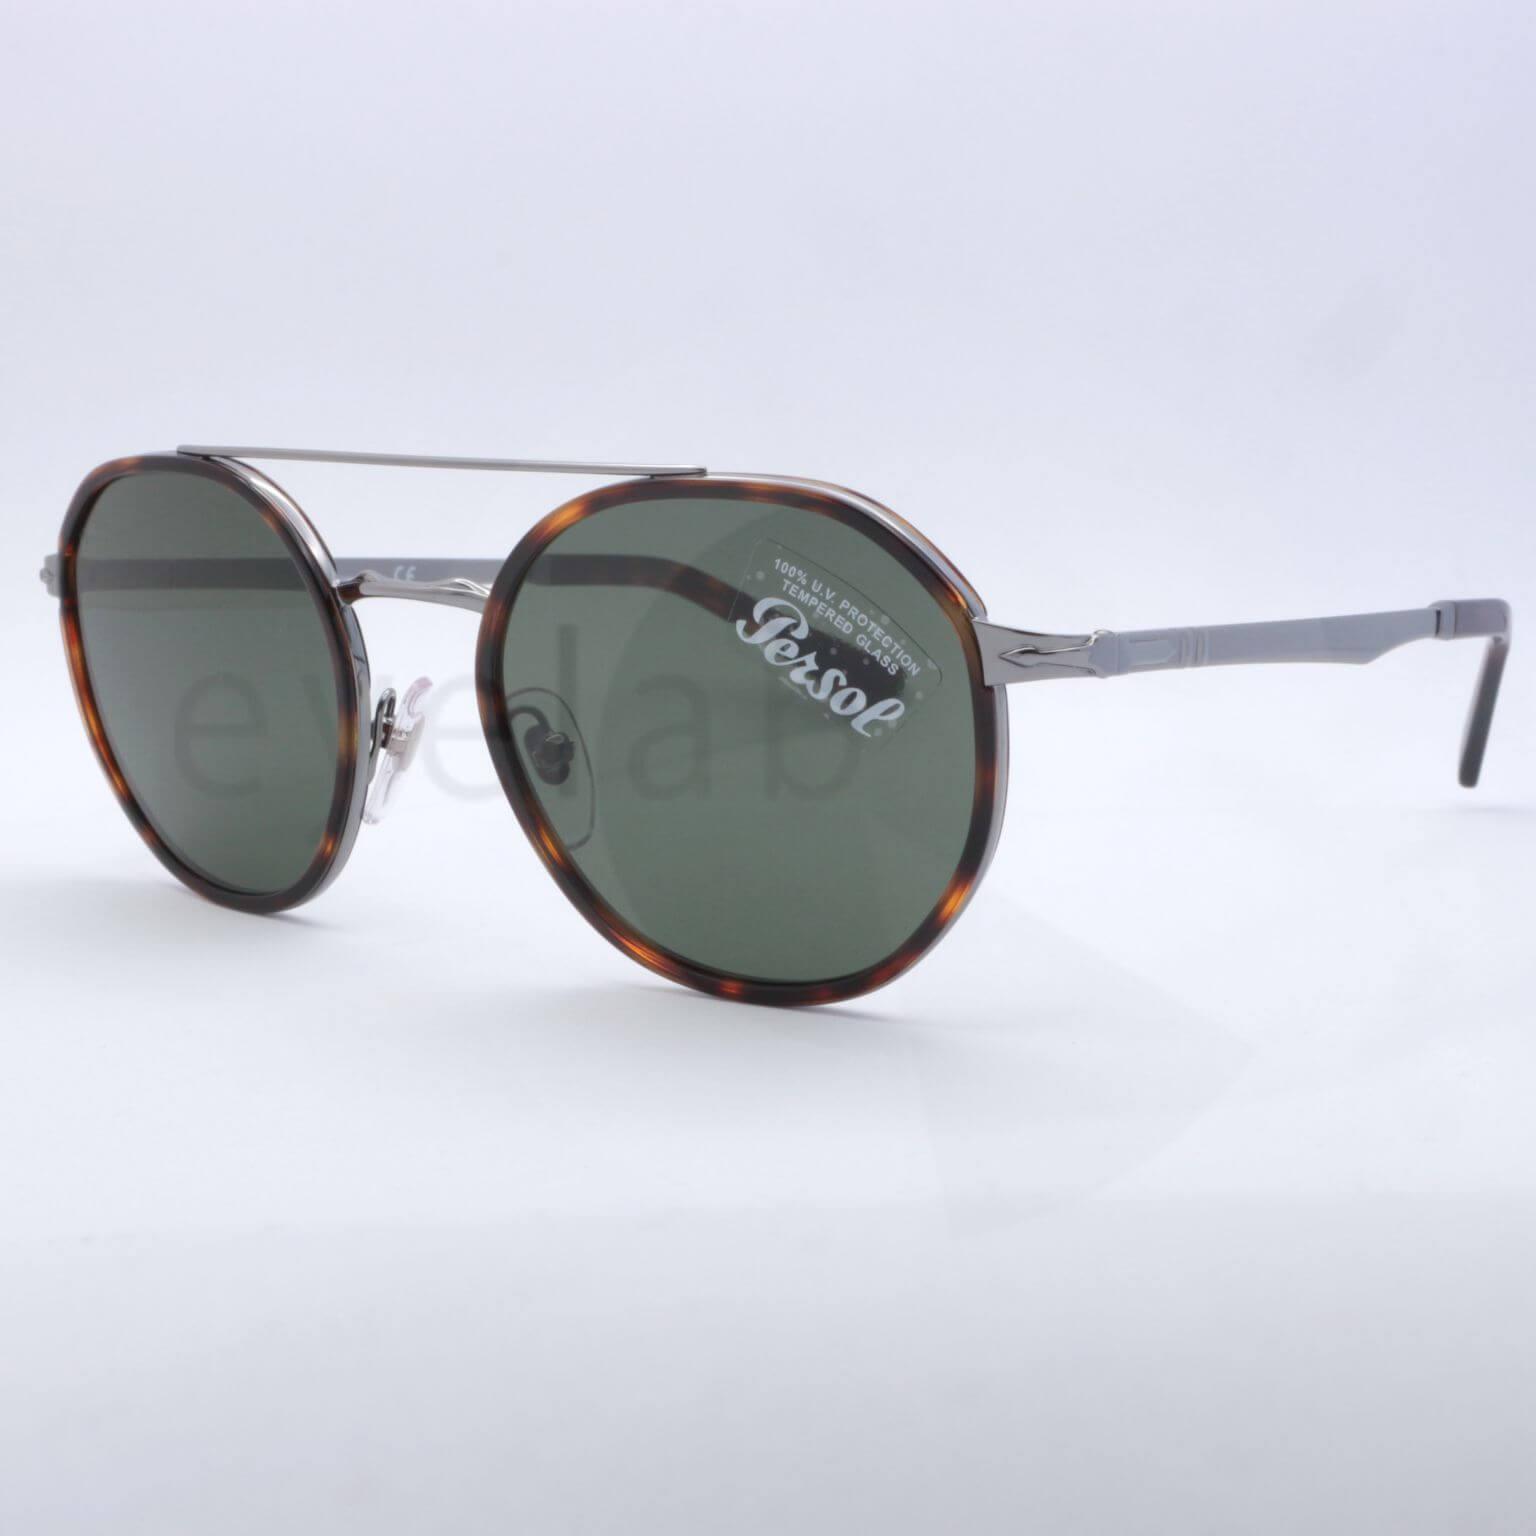 ed08ba067f Persol 2456S 51331 53 sunglasses ~ Οπτικά Eyelab